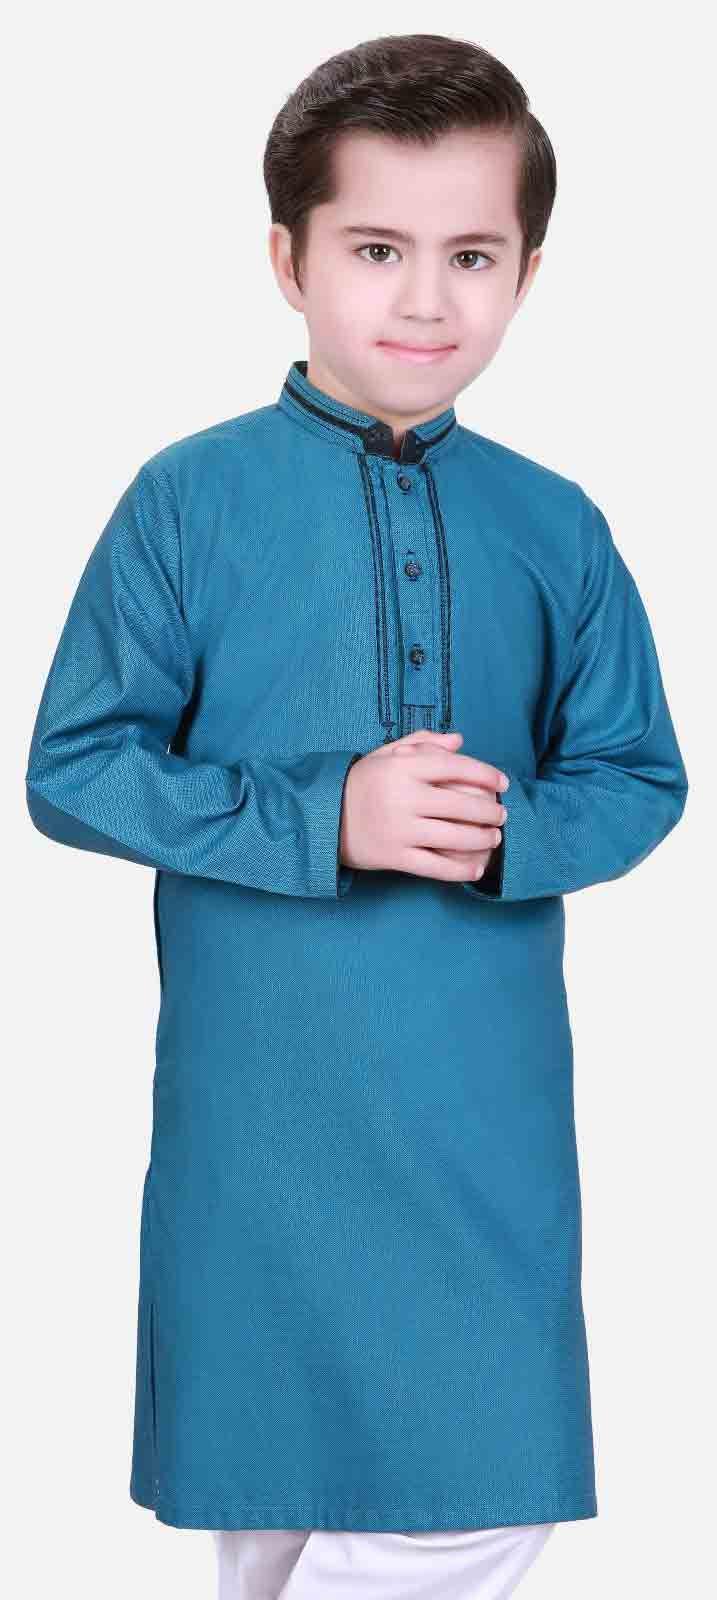 Eid kids kurta shalwar kameez designs 2013 2014 - Here Are The Latest Kids Eid Dresses For Little Boys In Pakistan 2017 By Edenrobe And Junaid Jamshed Grab The Eid Kurta Shalwar Kameez Or Jeans Shirt For